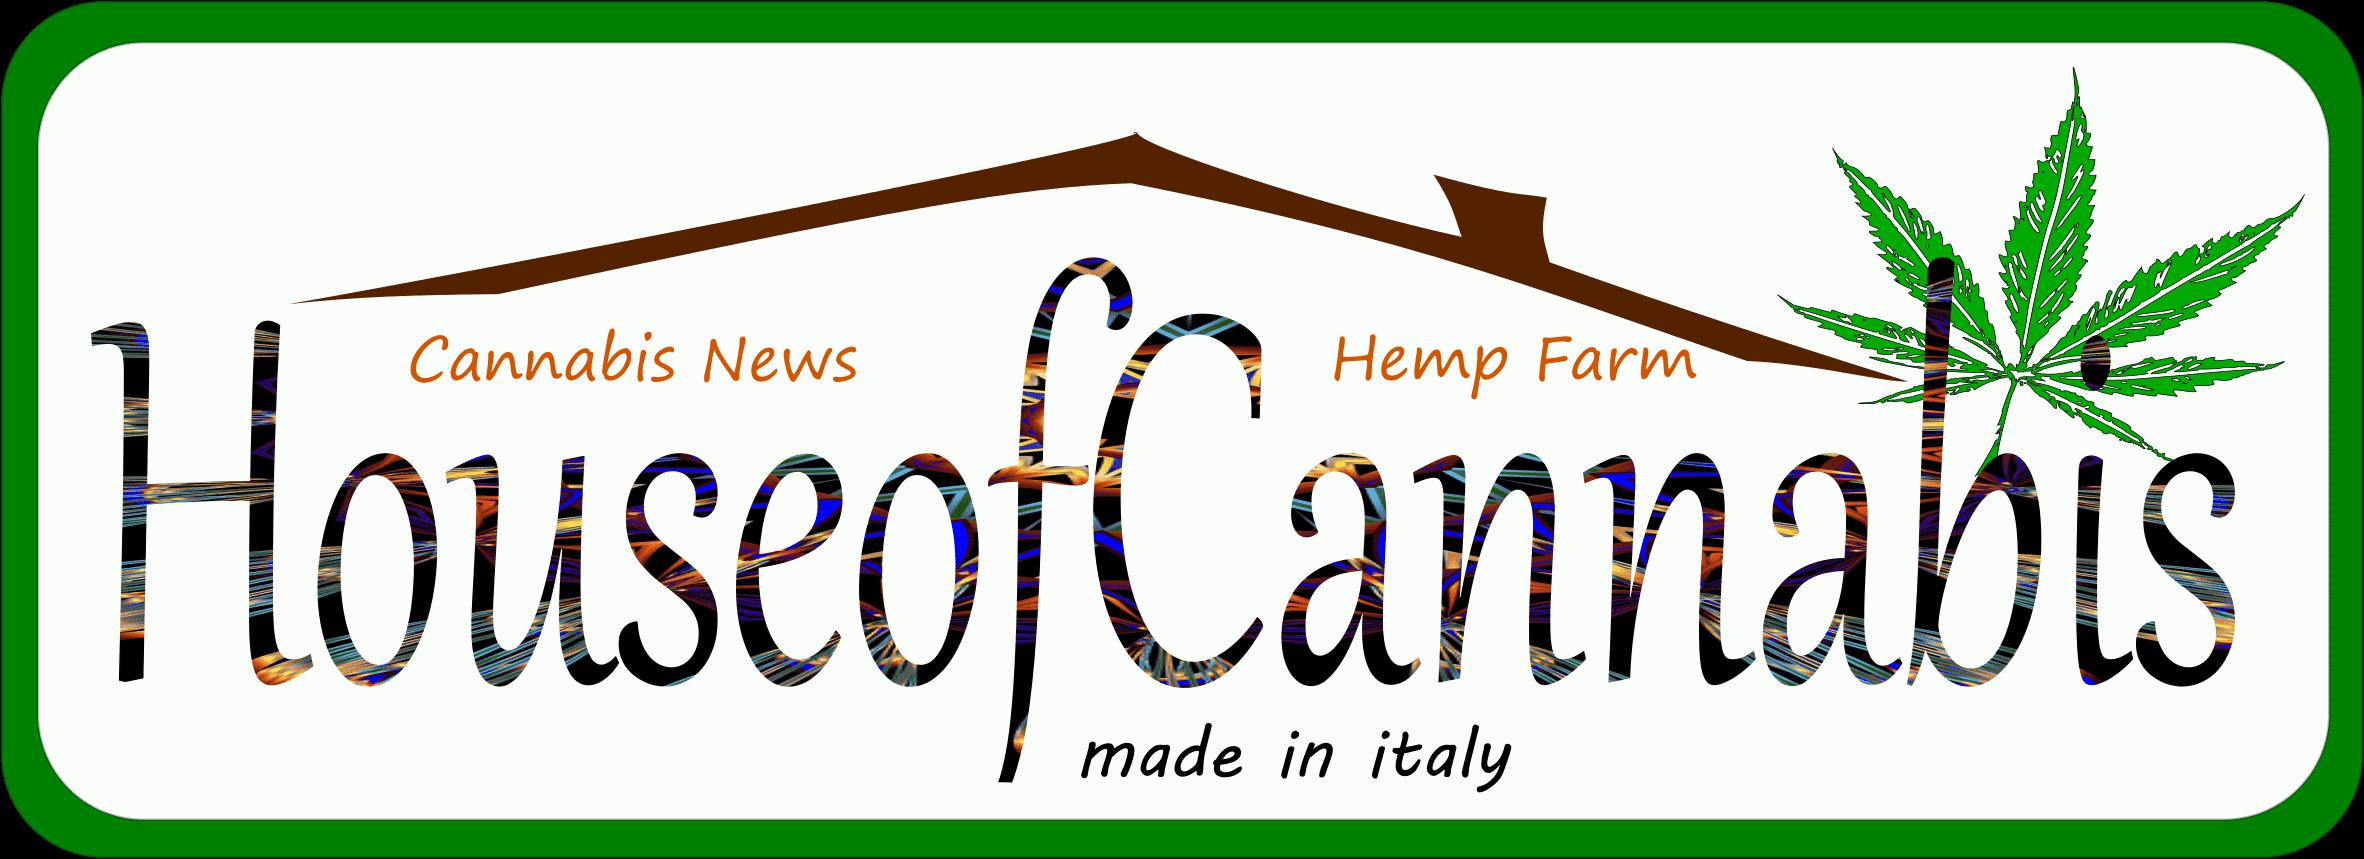 HouseofCannabis – HempFarm & CannabisBlog